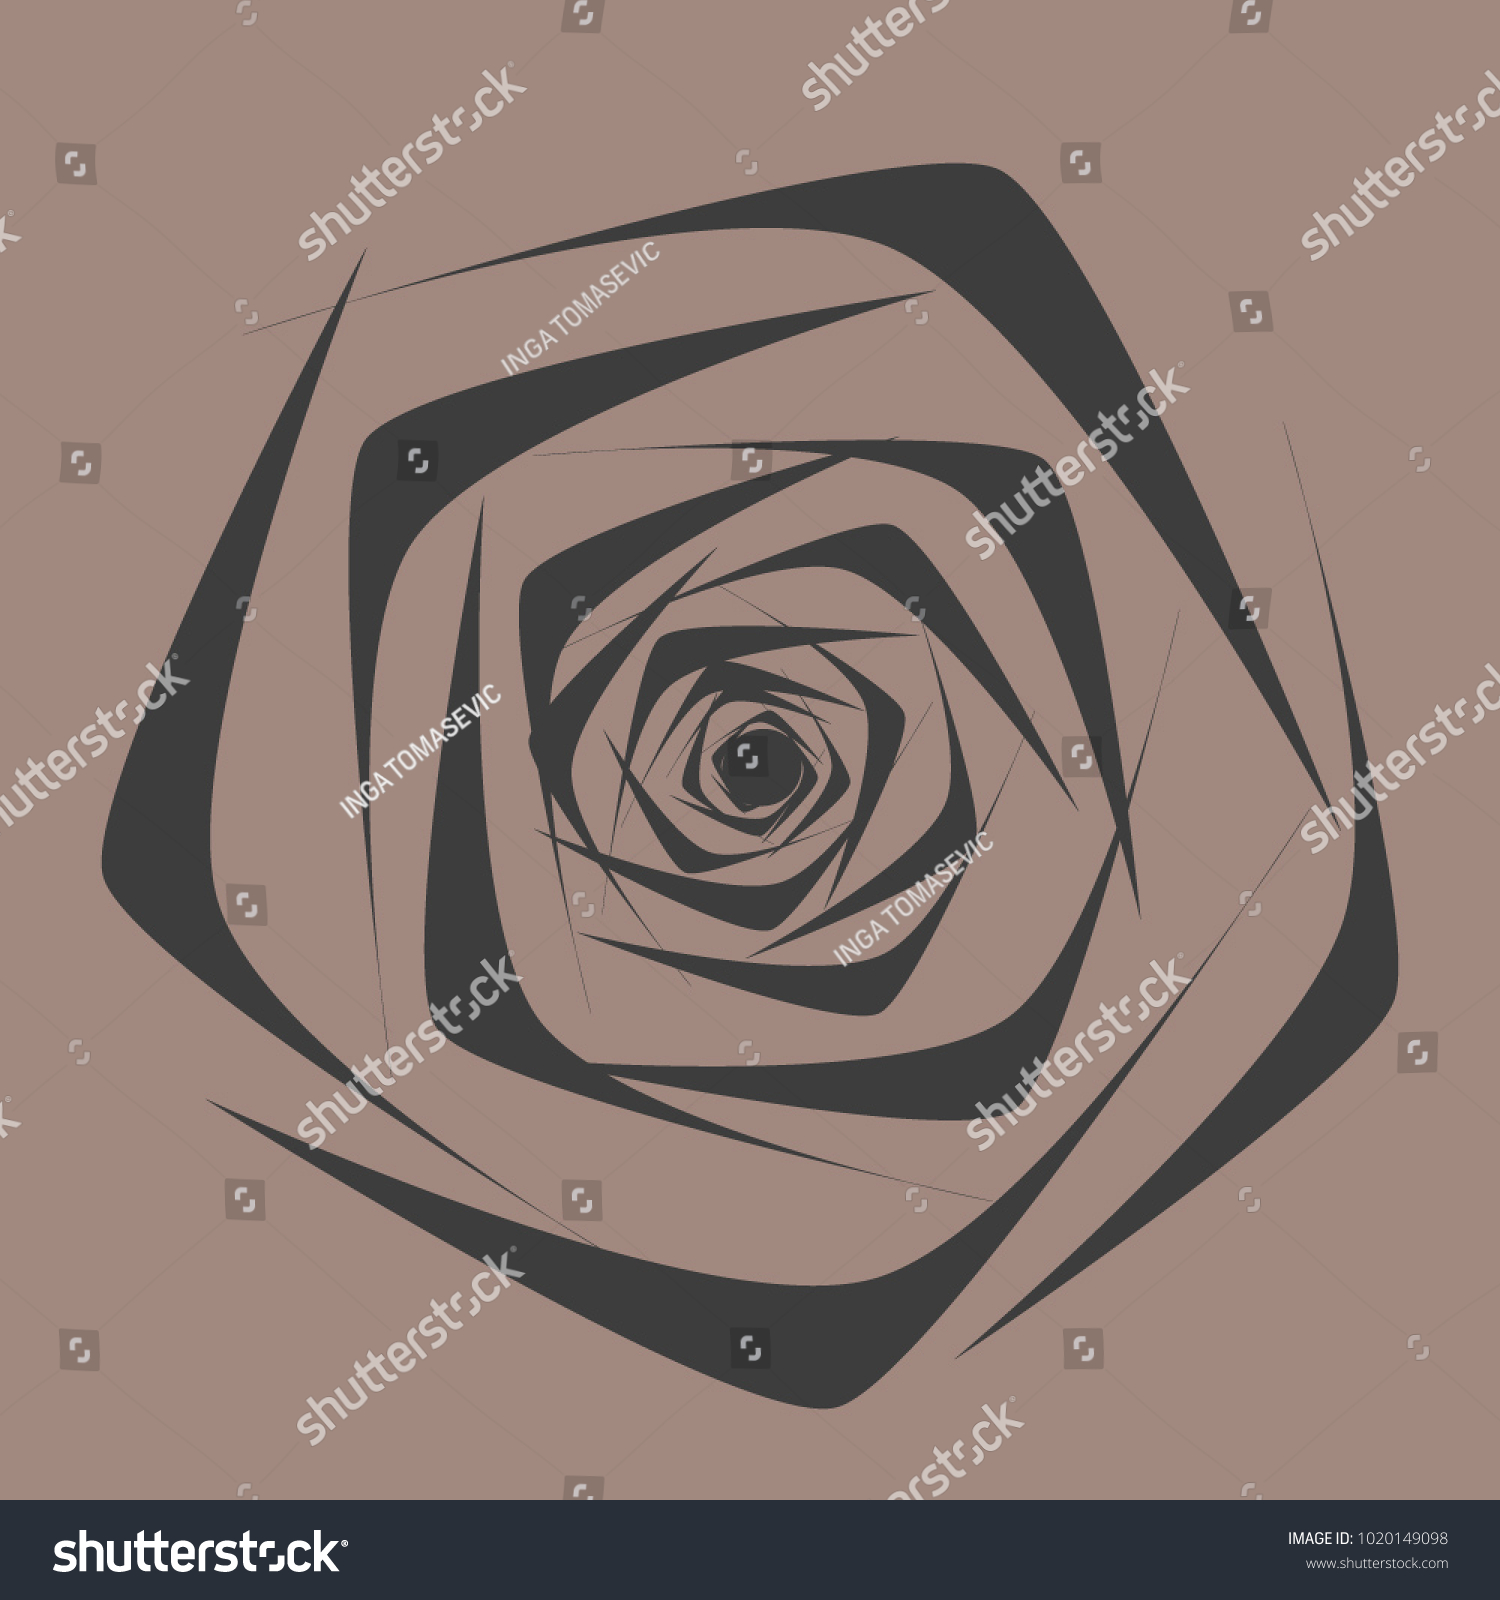 Rose vector flower beautiful black rose stock vector royalty free rose vector flower beautiful black rose in ethnic style for textile tile izmirmasajfo